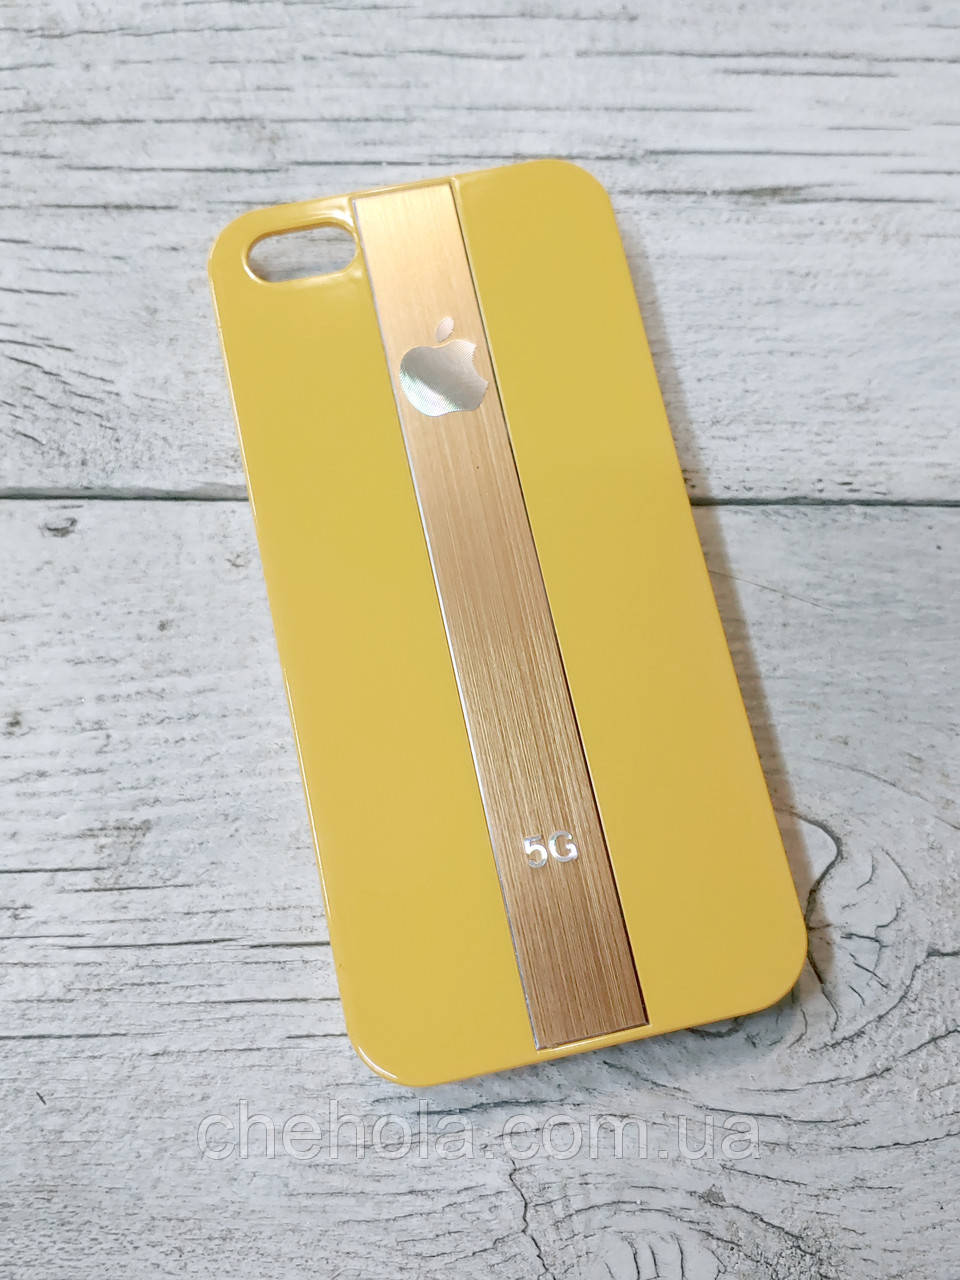 Протиударний Чохол для Iphone 5 5S SE Juicy Metal Помаранчевий